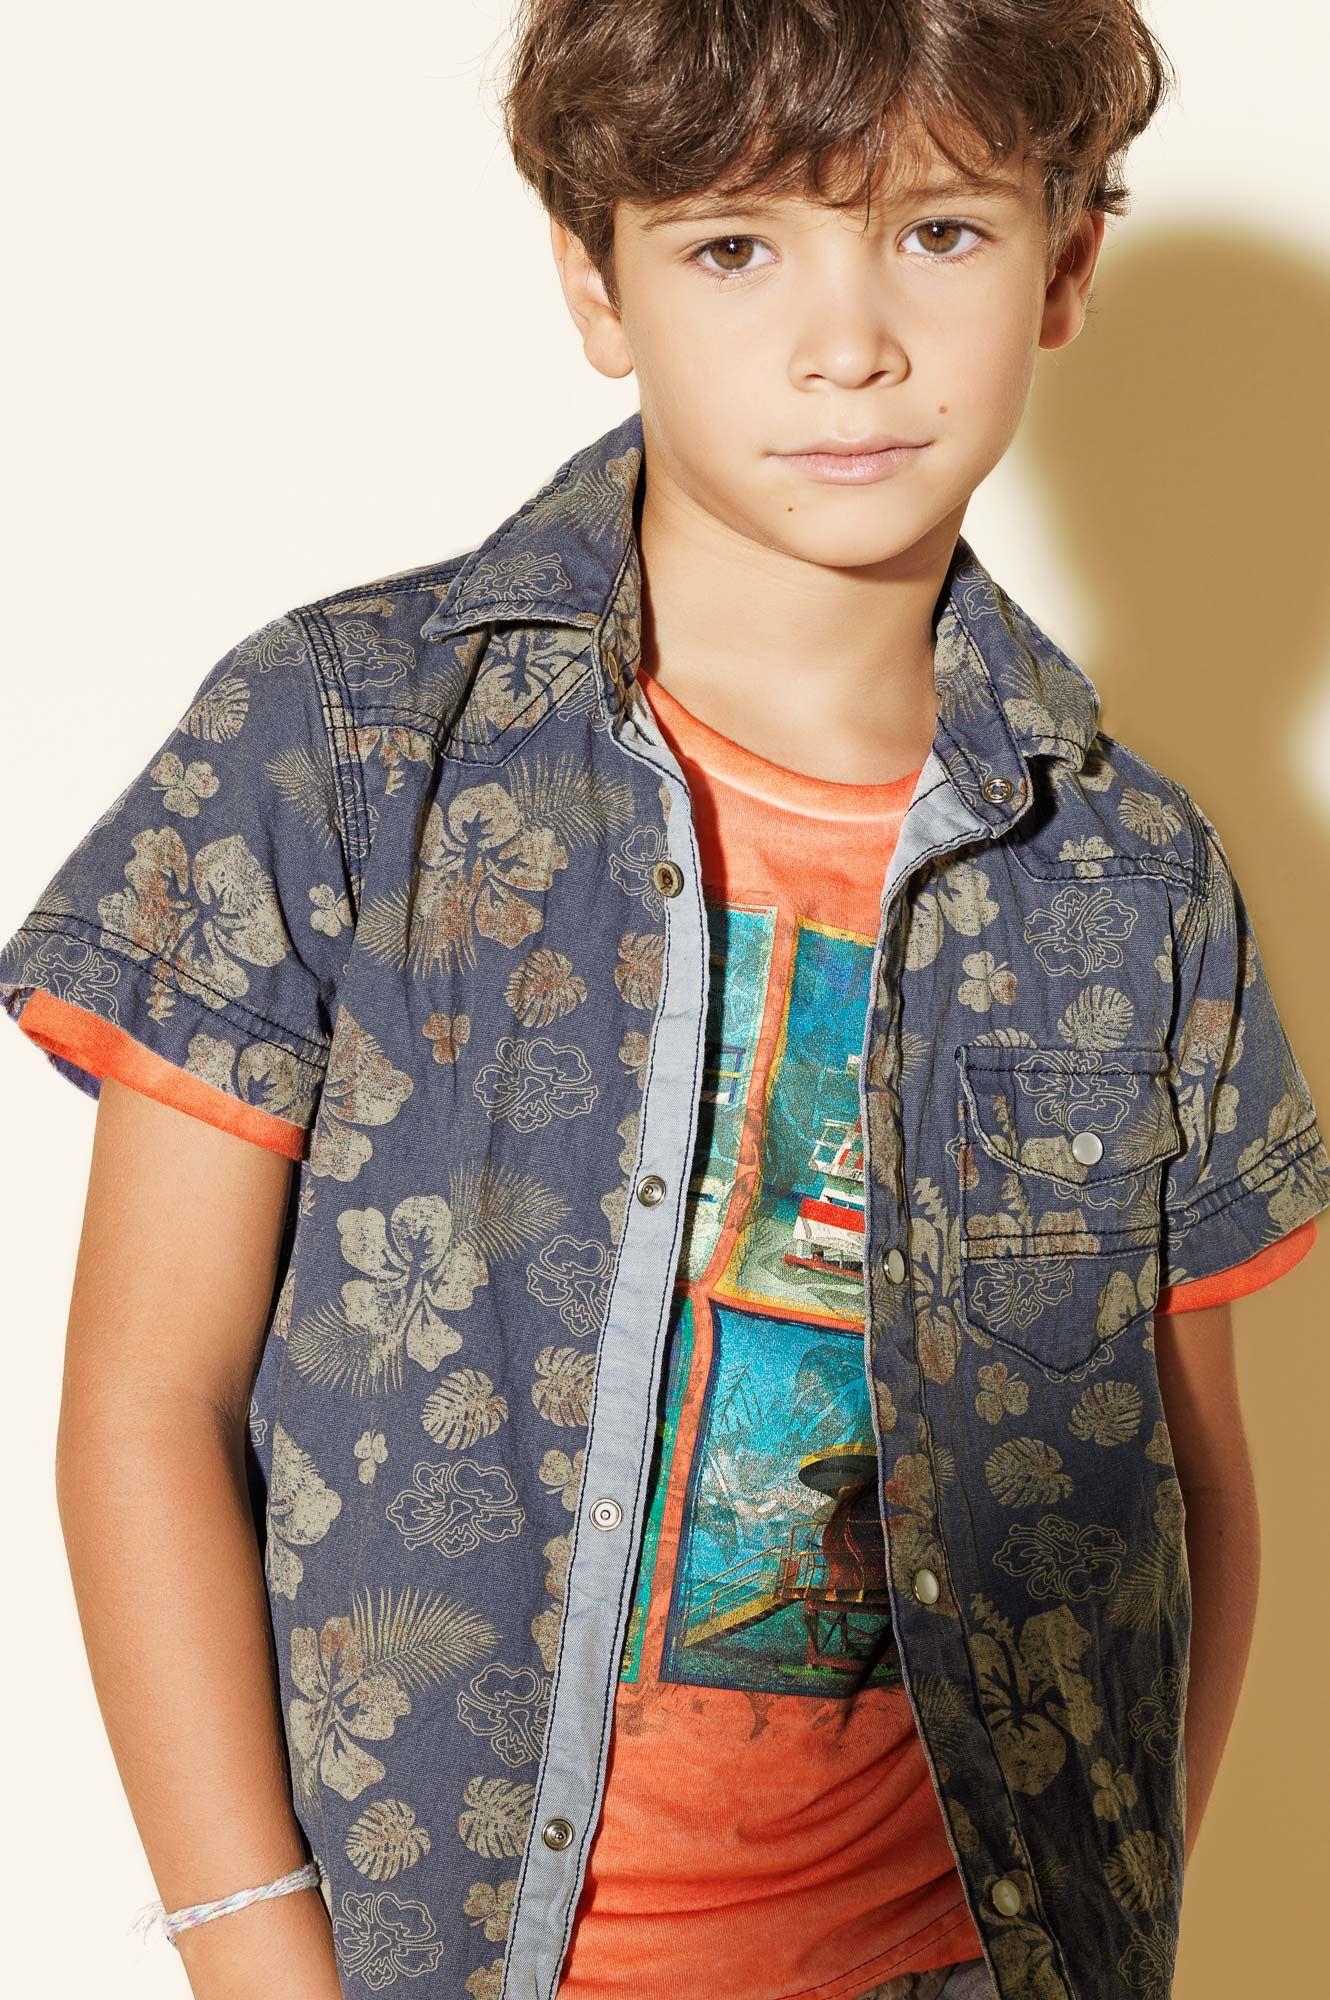 c36fbdb3 sarabanda-collezione-pe-15-t-shirt-bambino-3 | My Prince *Jacob ...